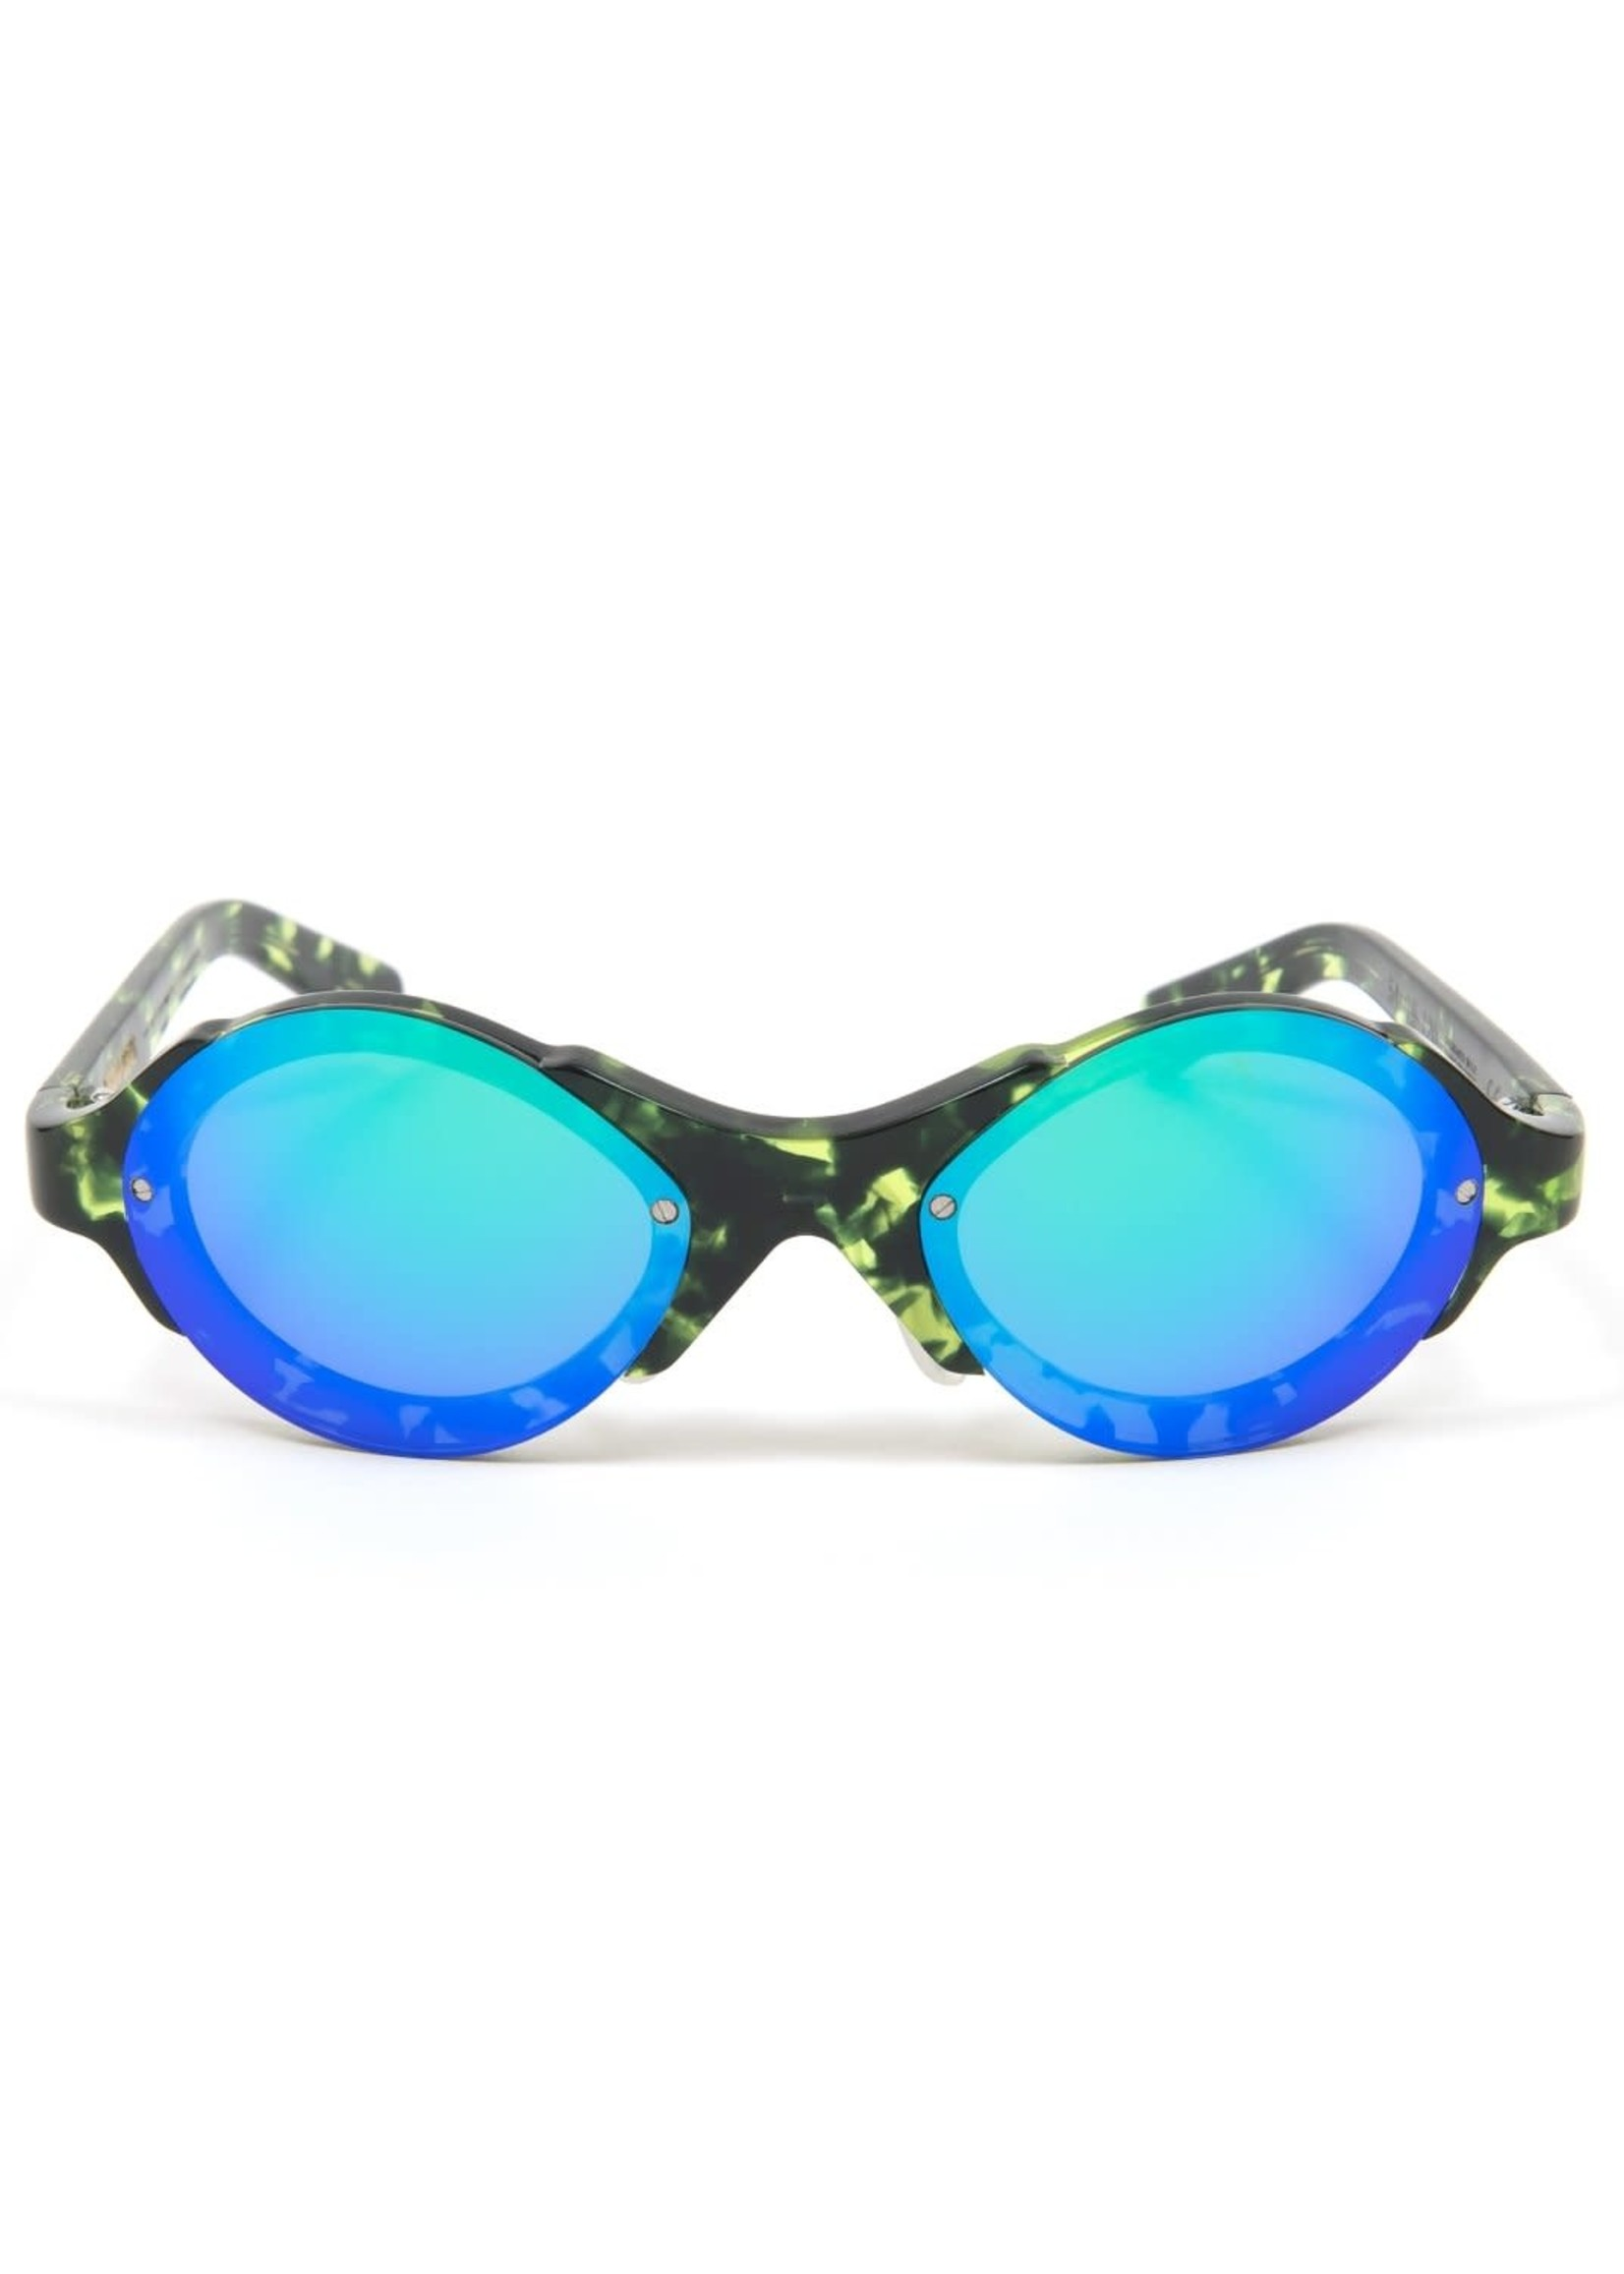 Brain Dead Mutant Sunglasses in Green Tortoise/Blue Reflective